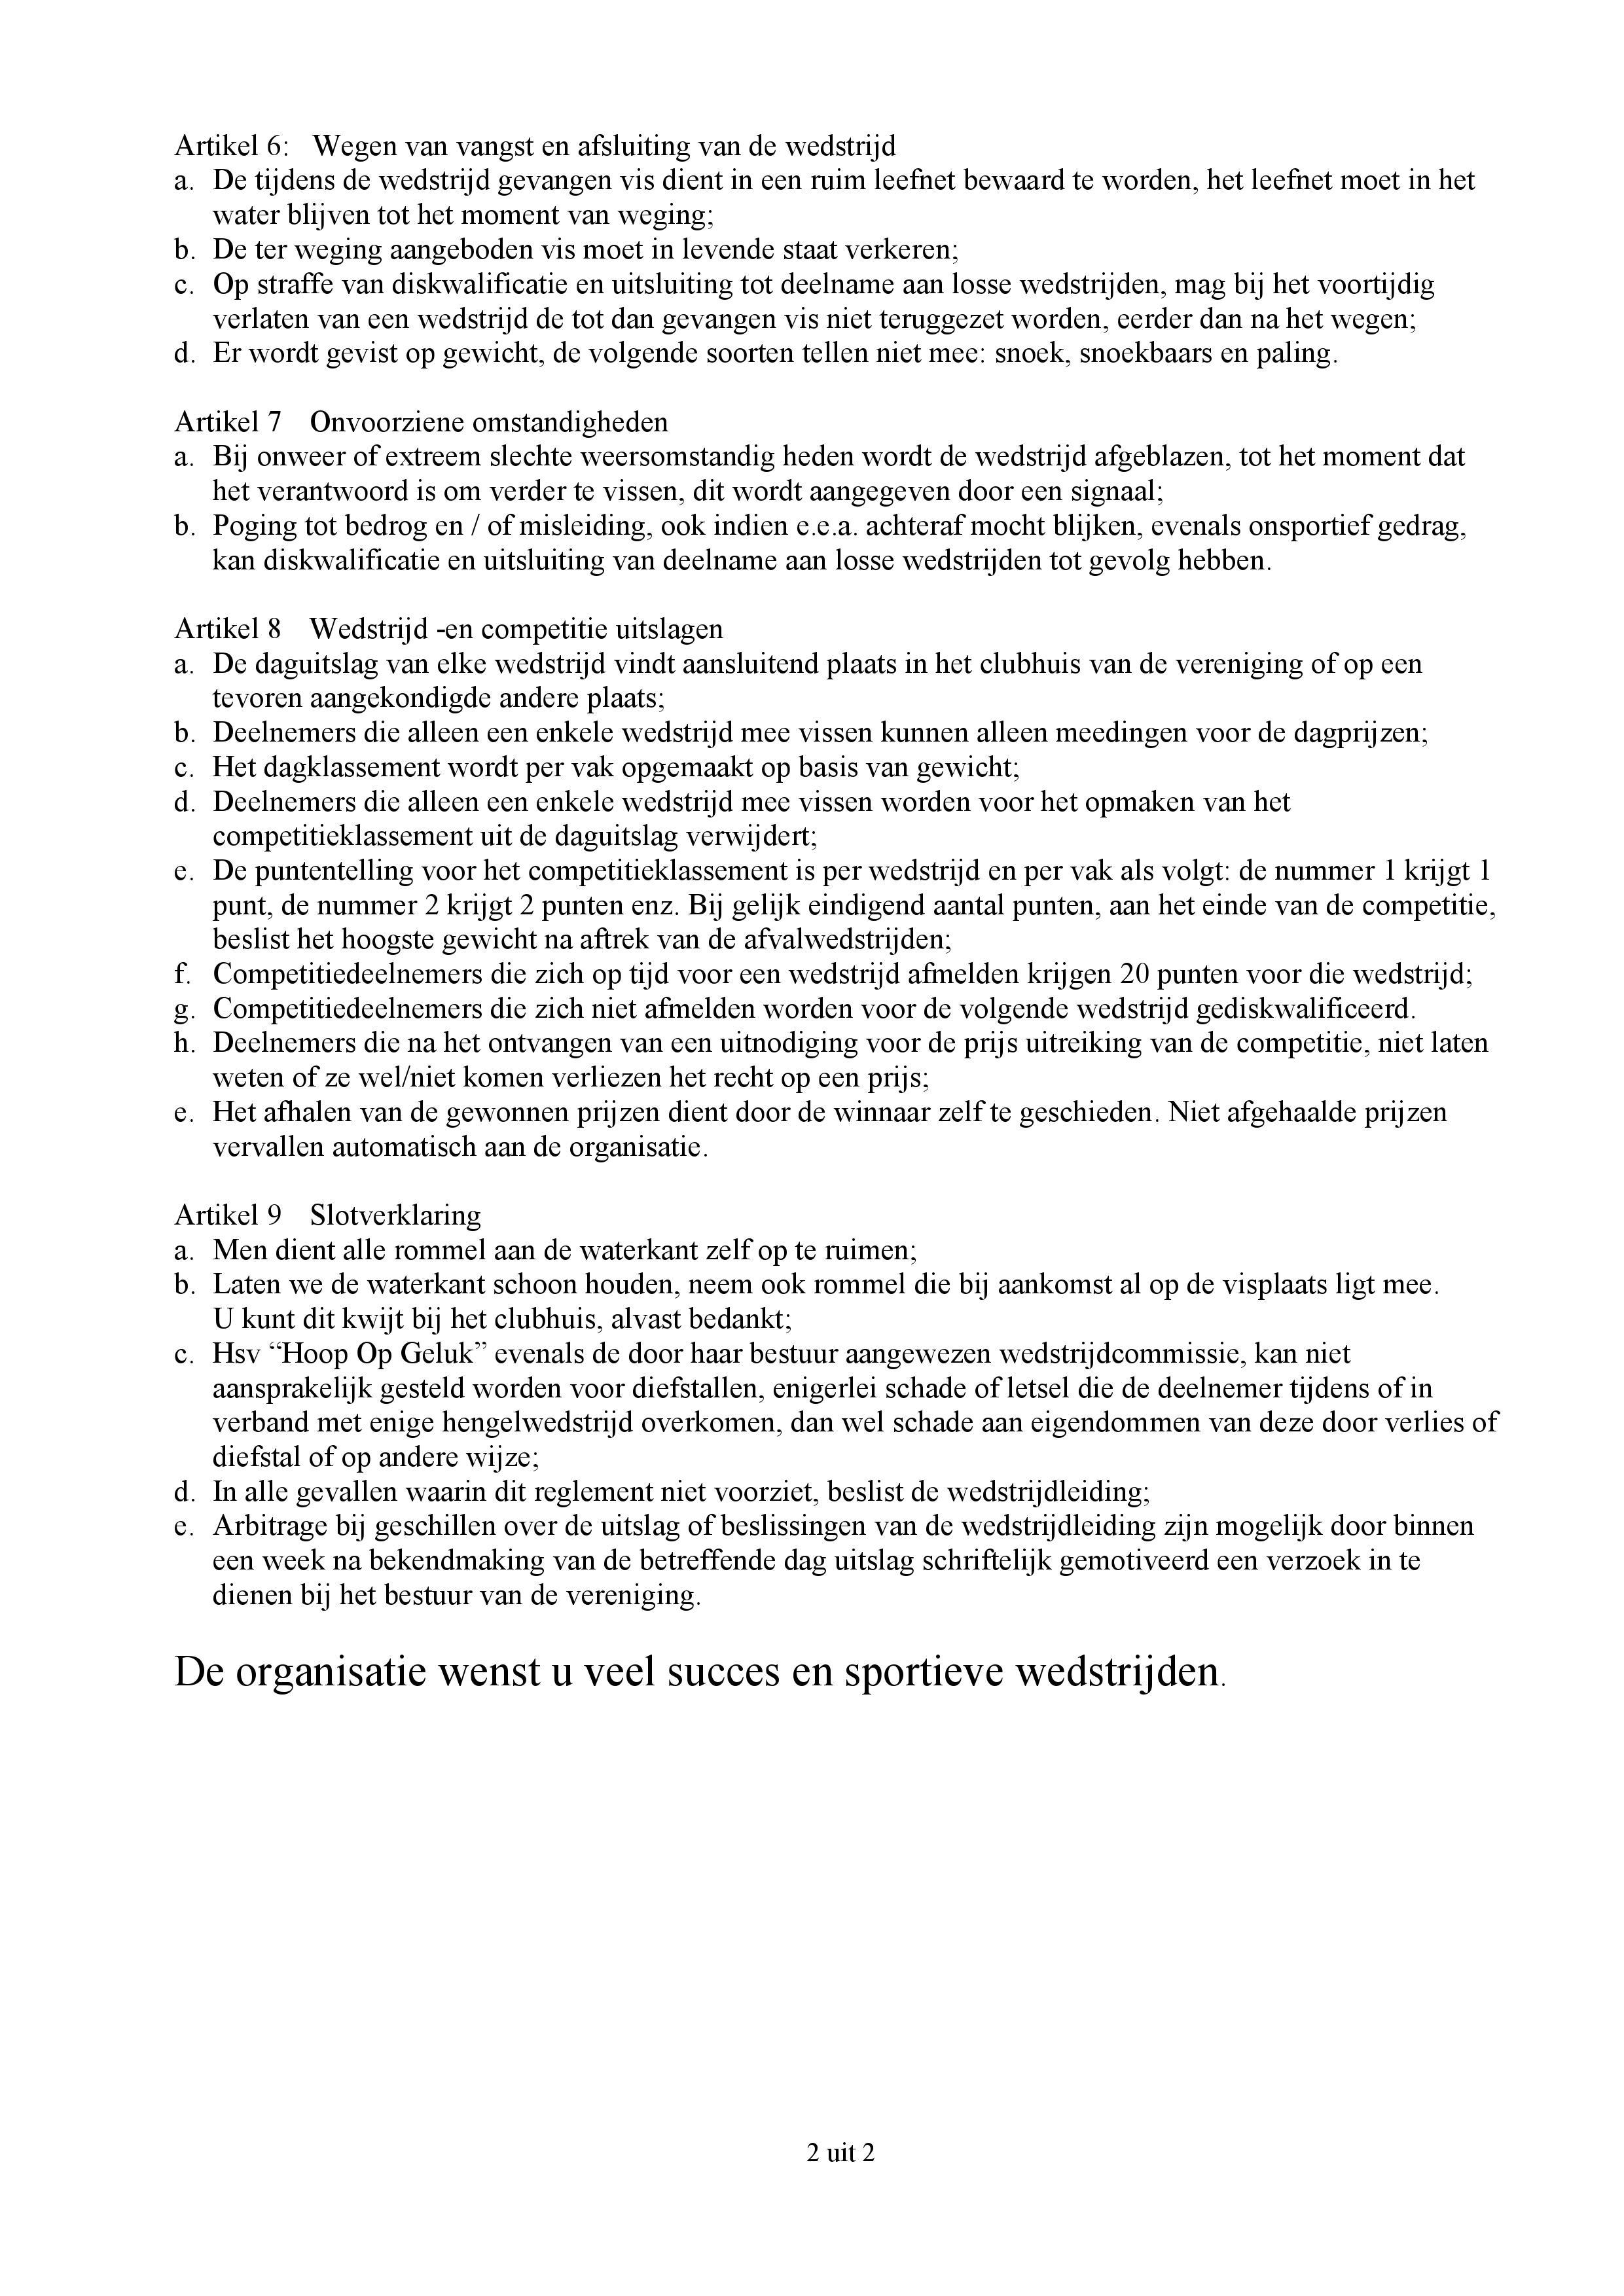 Reglement 2020 Vaste Stok (blad 2)